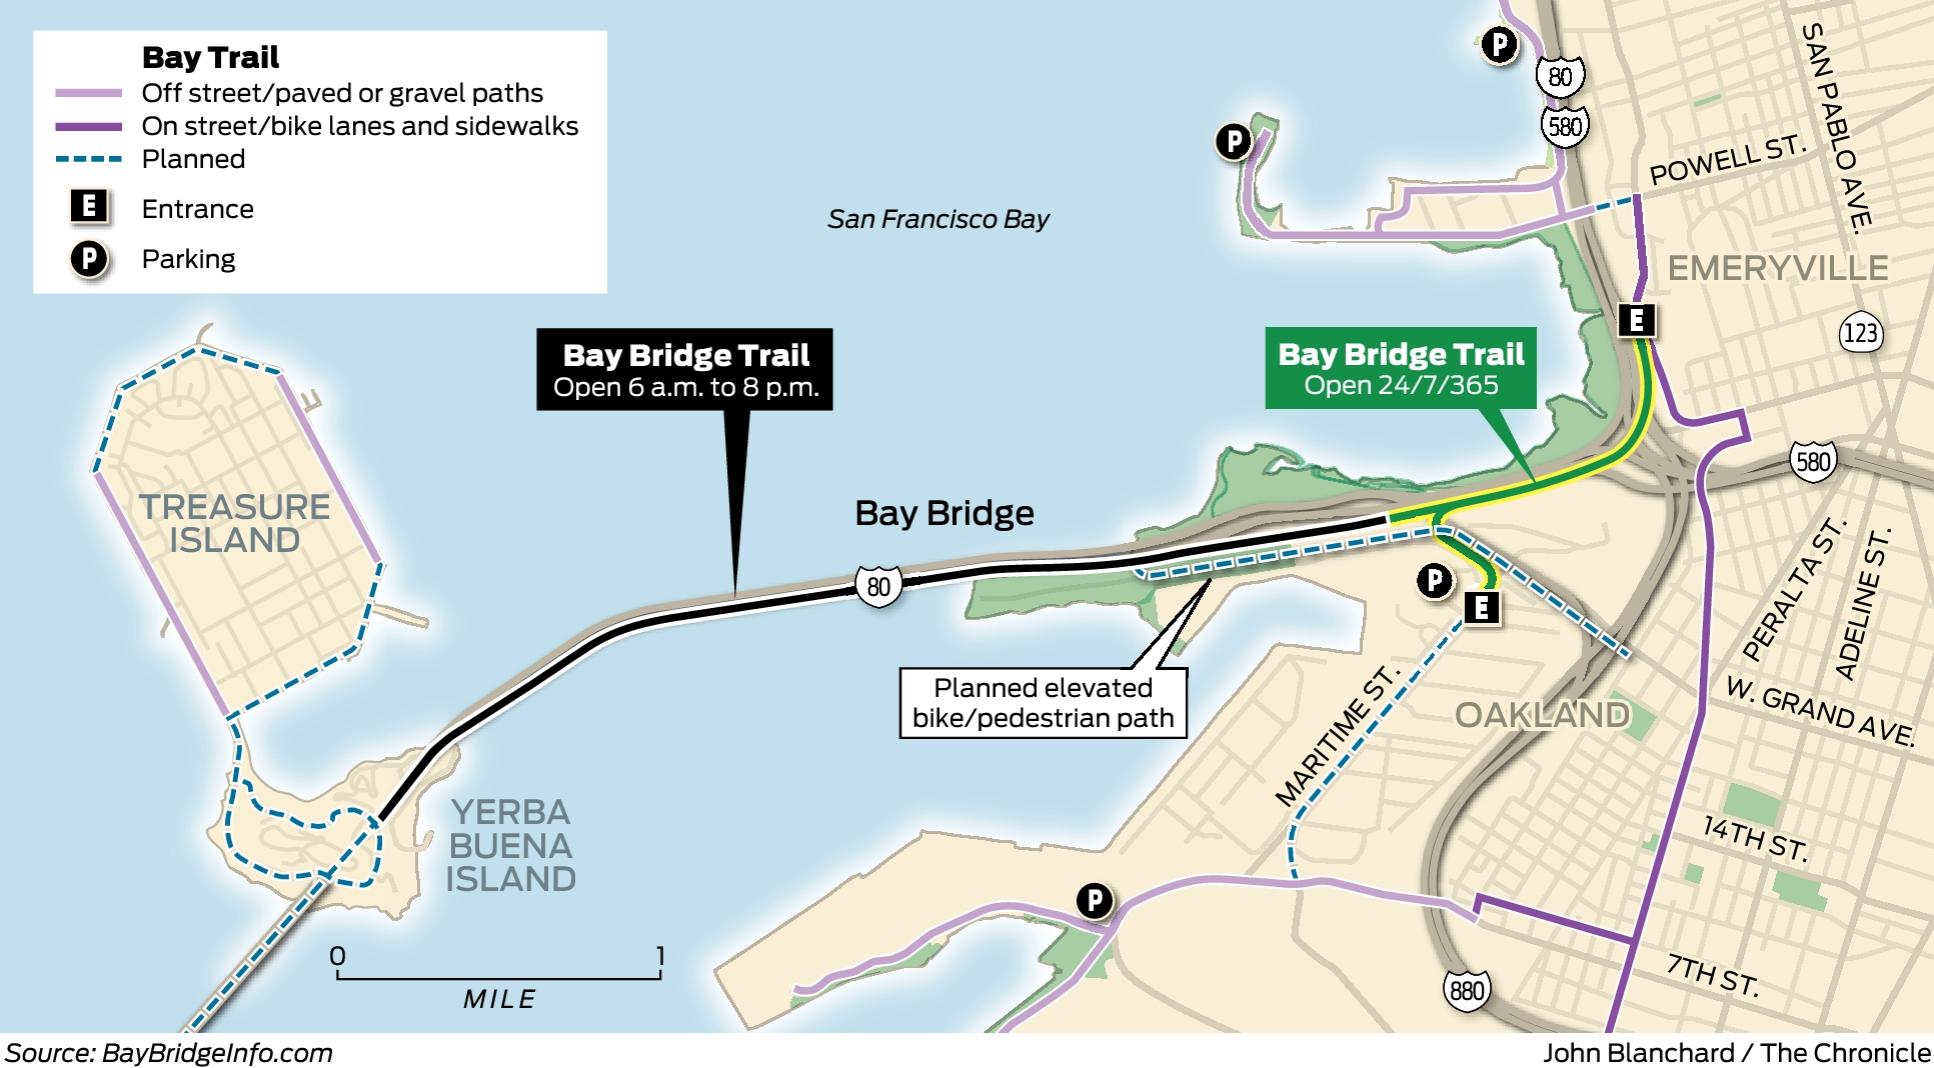 Bay Bridge Bike Ride Now Goes Halfway To Sf 7 Days A Week